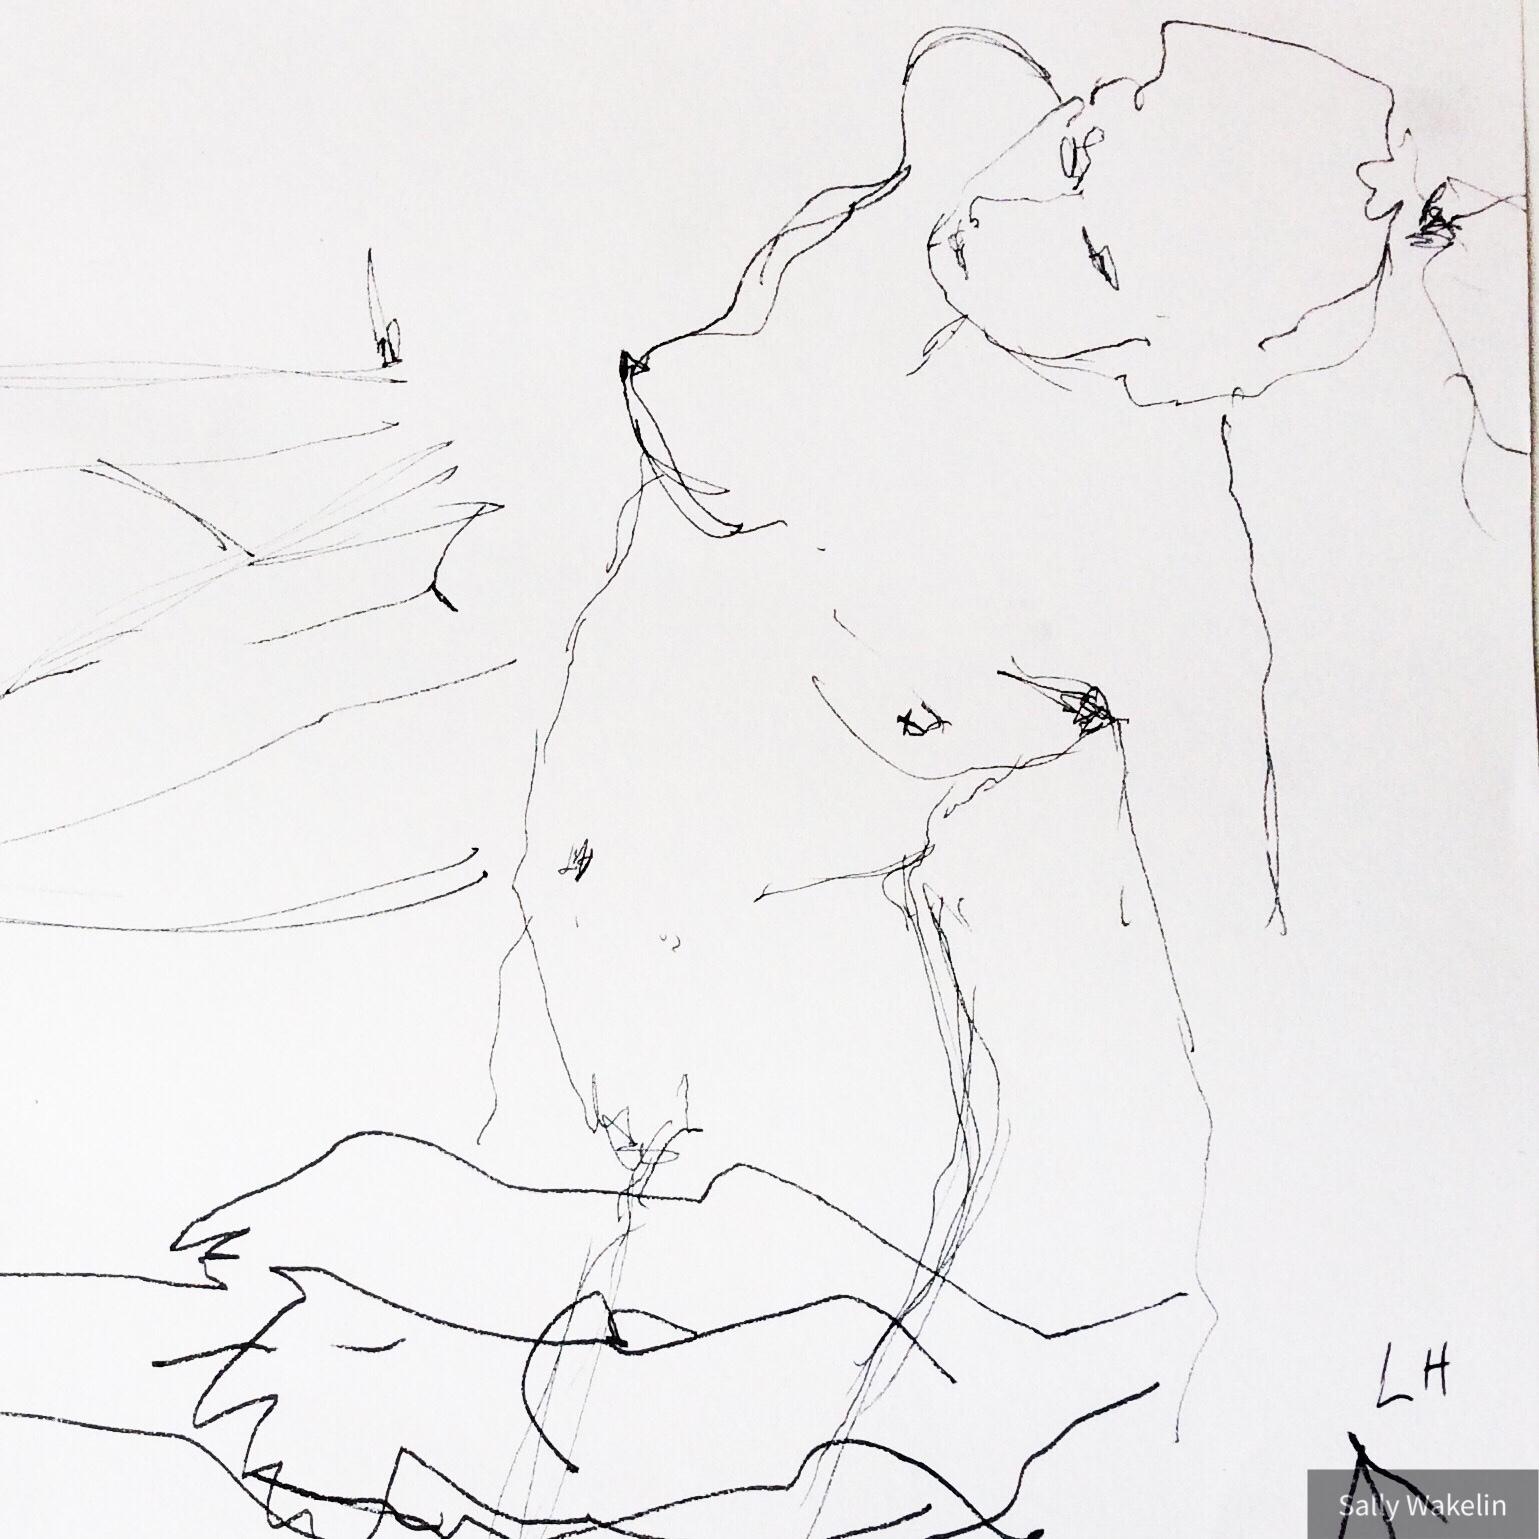 1539x1539 Painting Sally Wakelin Studies In Creativity